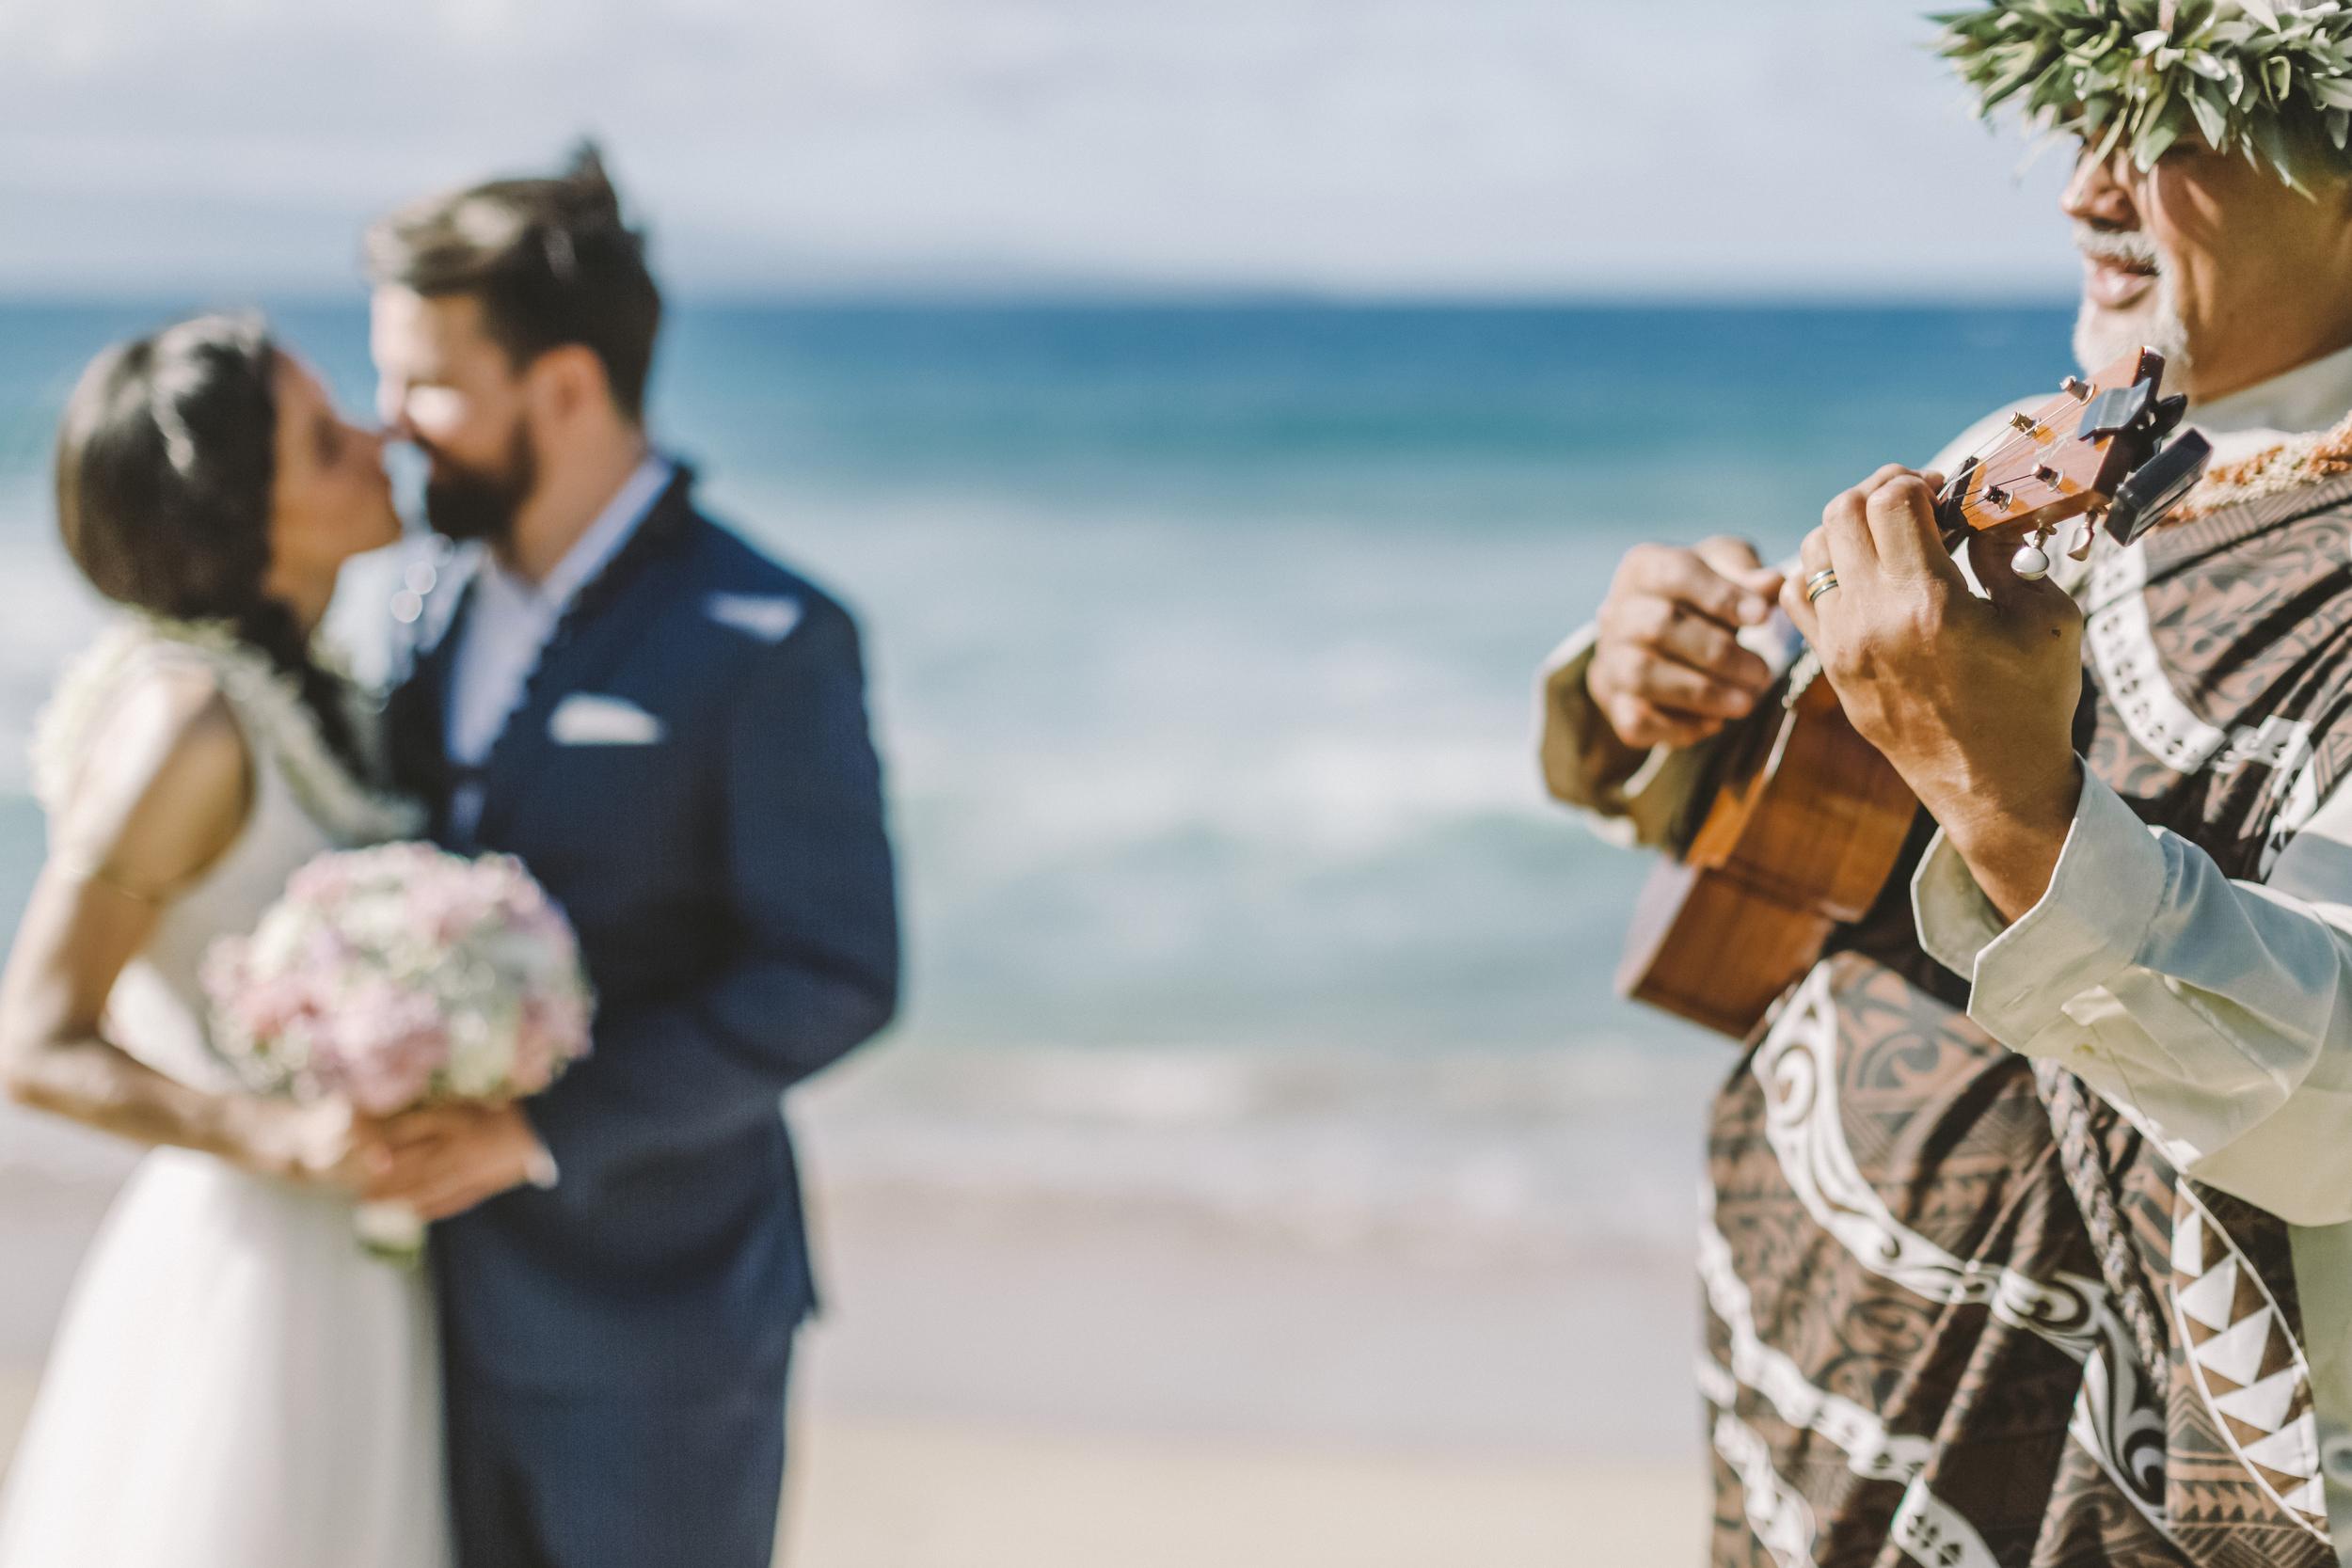 angie-diaz-photography-maui-wedding-ironwoods-beach-21.jpg